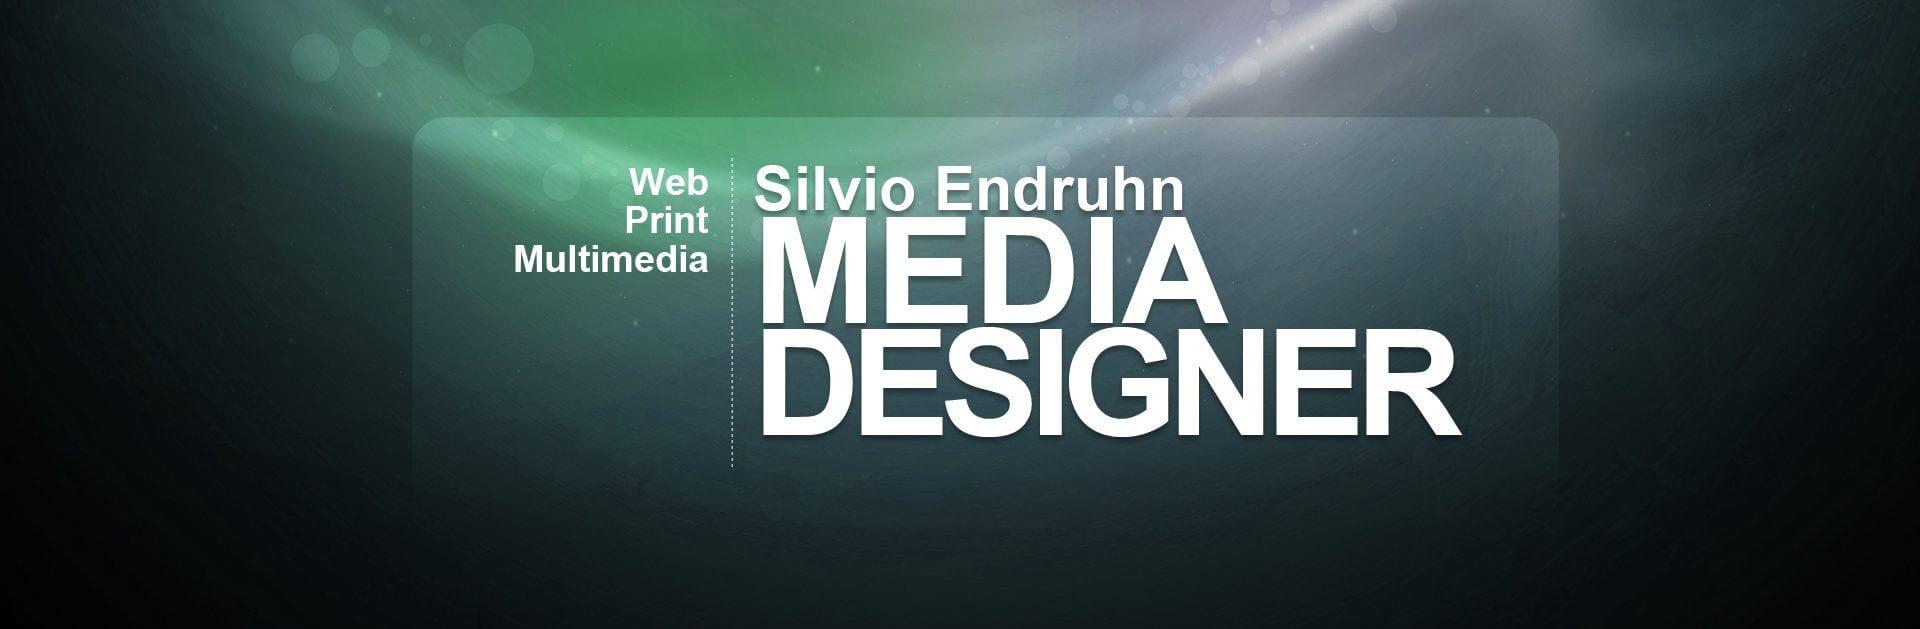 Mediadesigner Silvio Endruhn